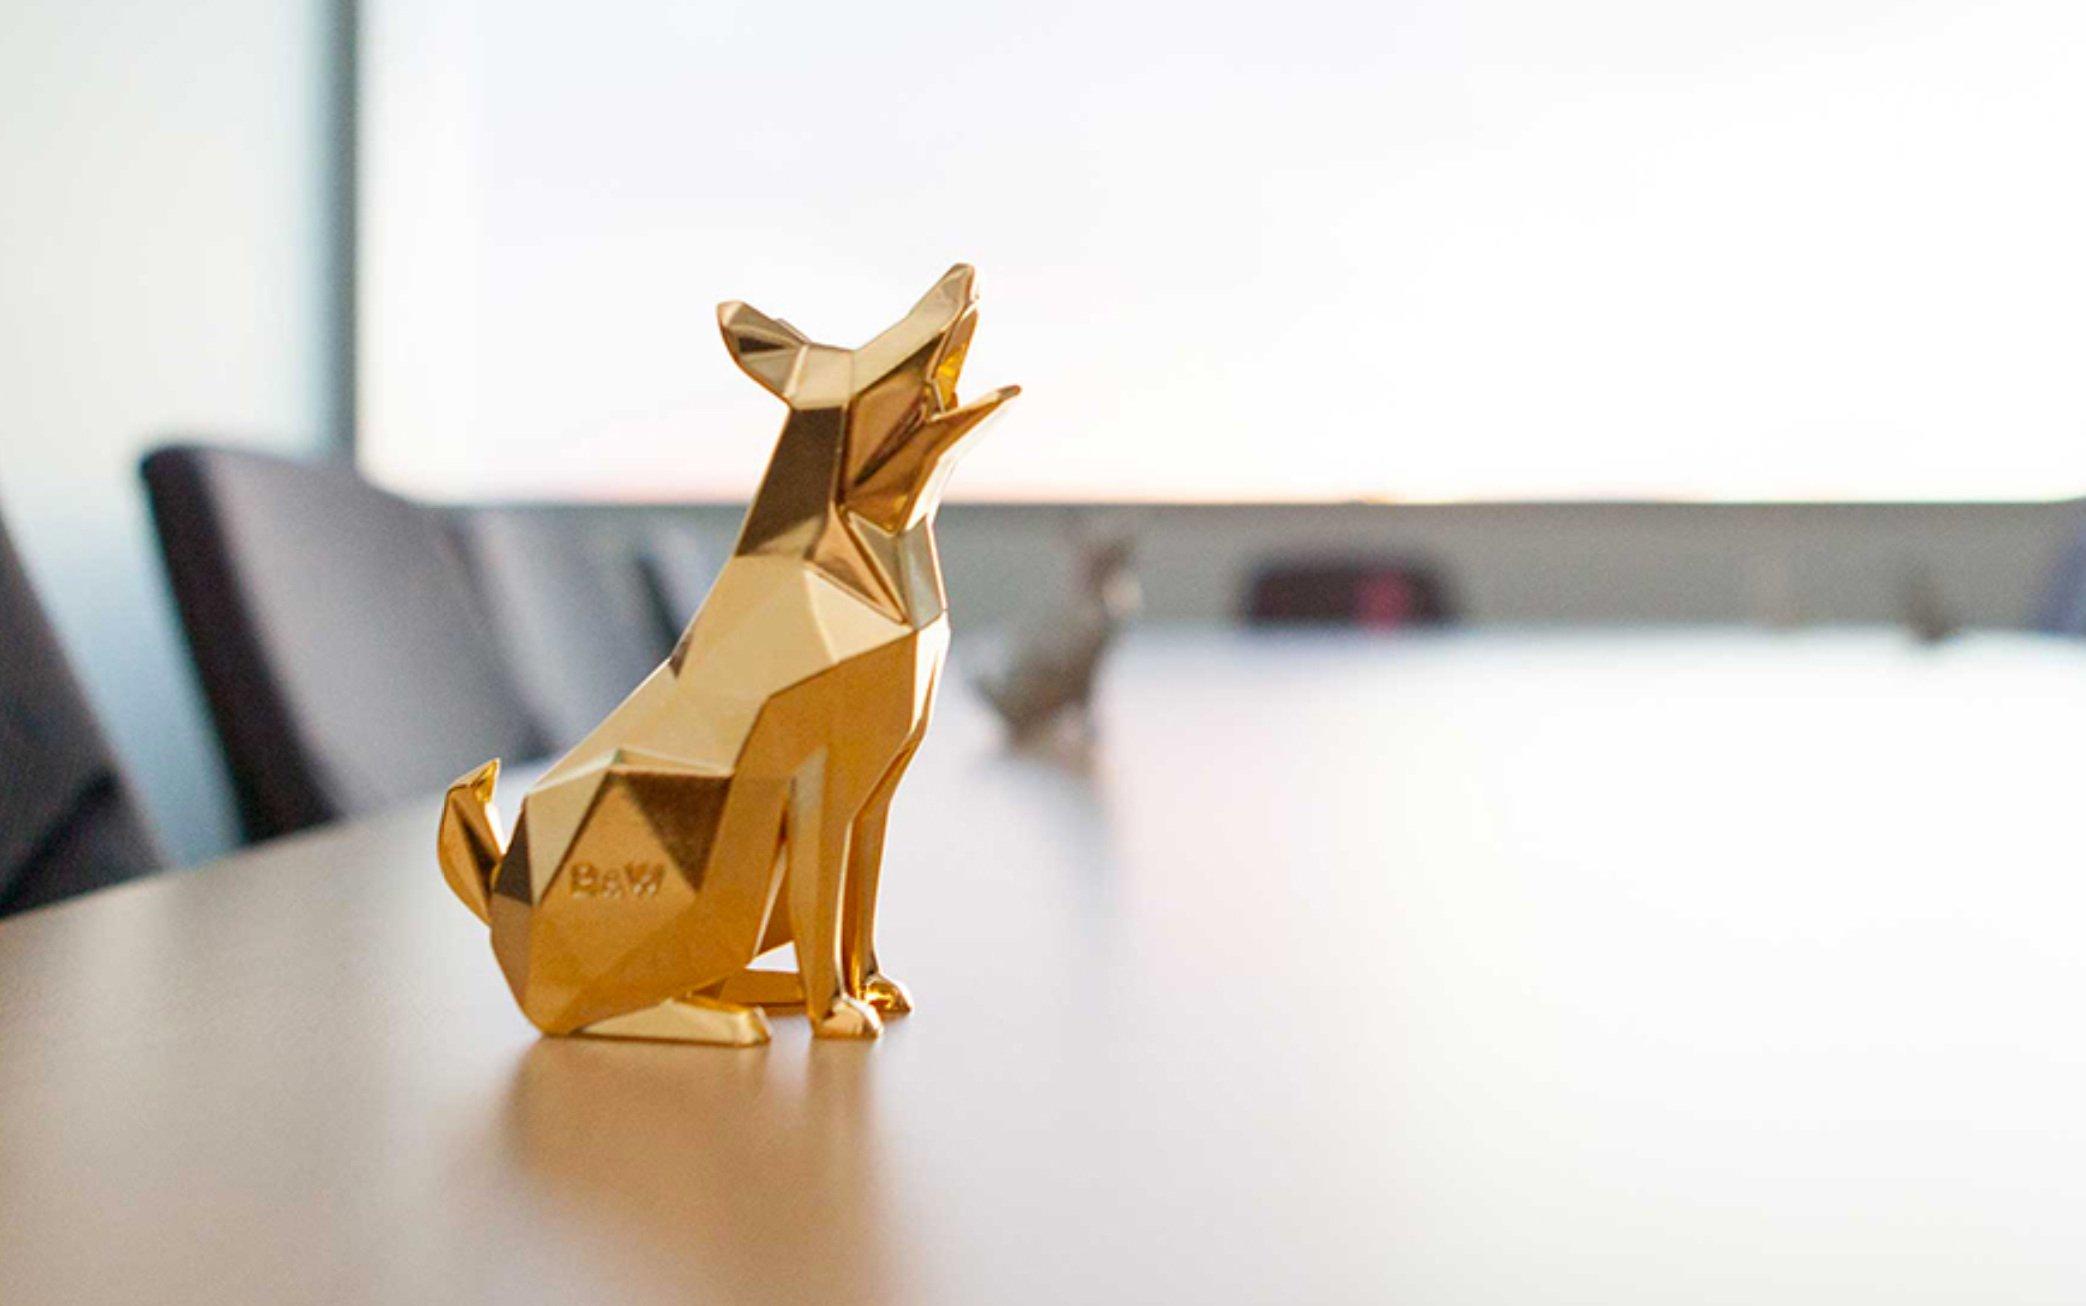 PrintaBit: The Artist's 3D Print Service